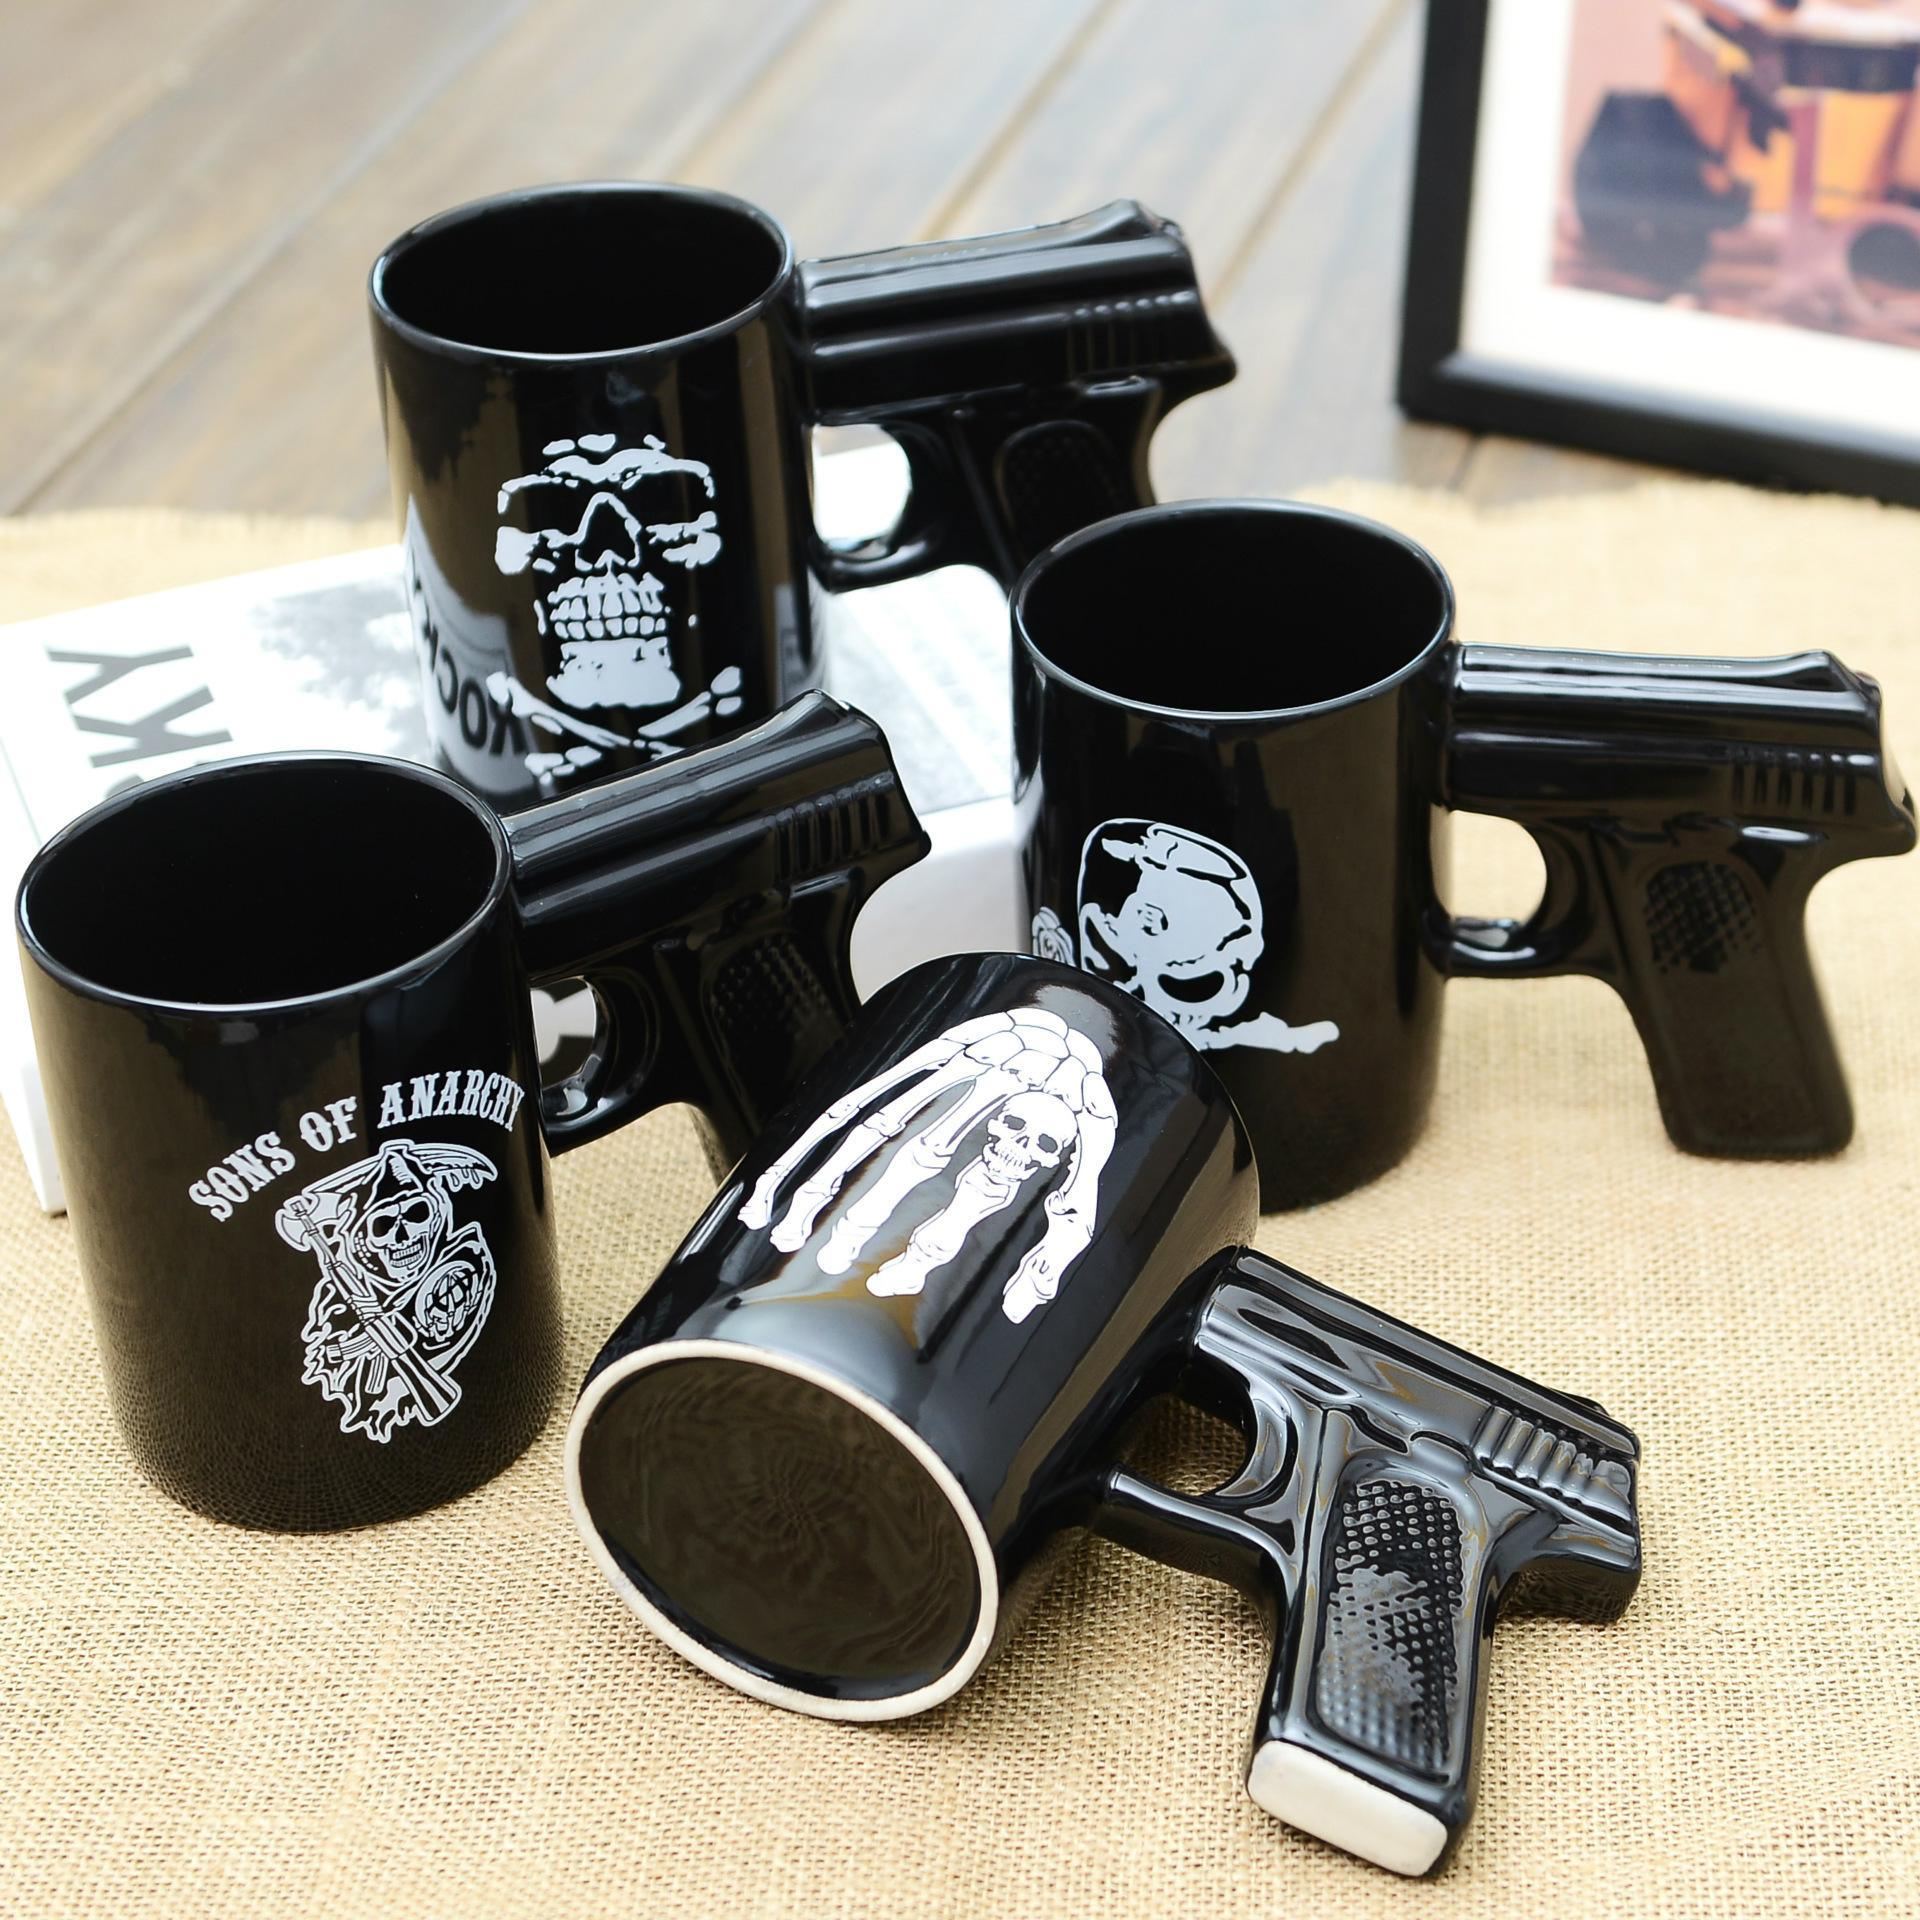 2018 creative pistol grip coffee cups mug funny gun skull mug milk tea cup creative office ceramic coffee mug drinkware cool mugs online cool travel mugs